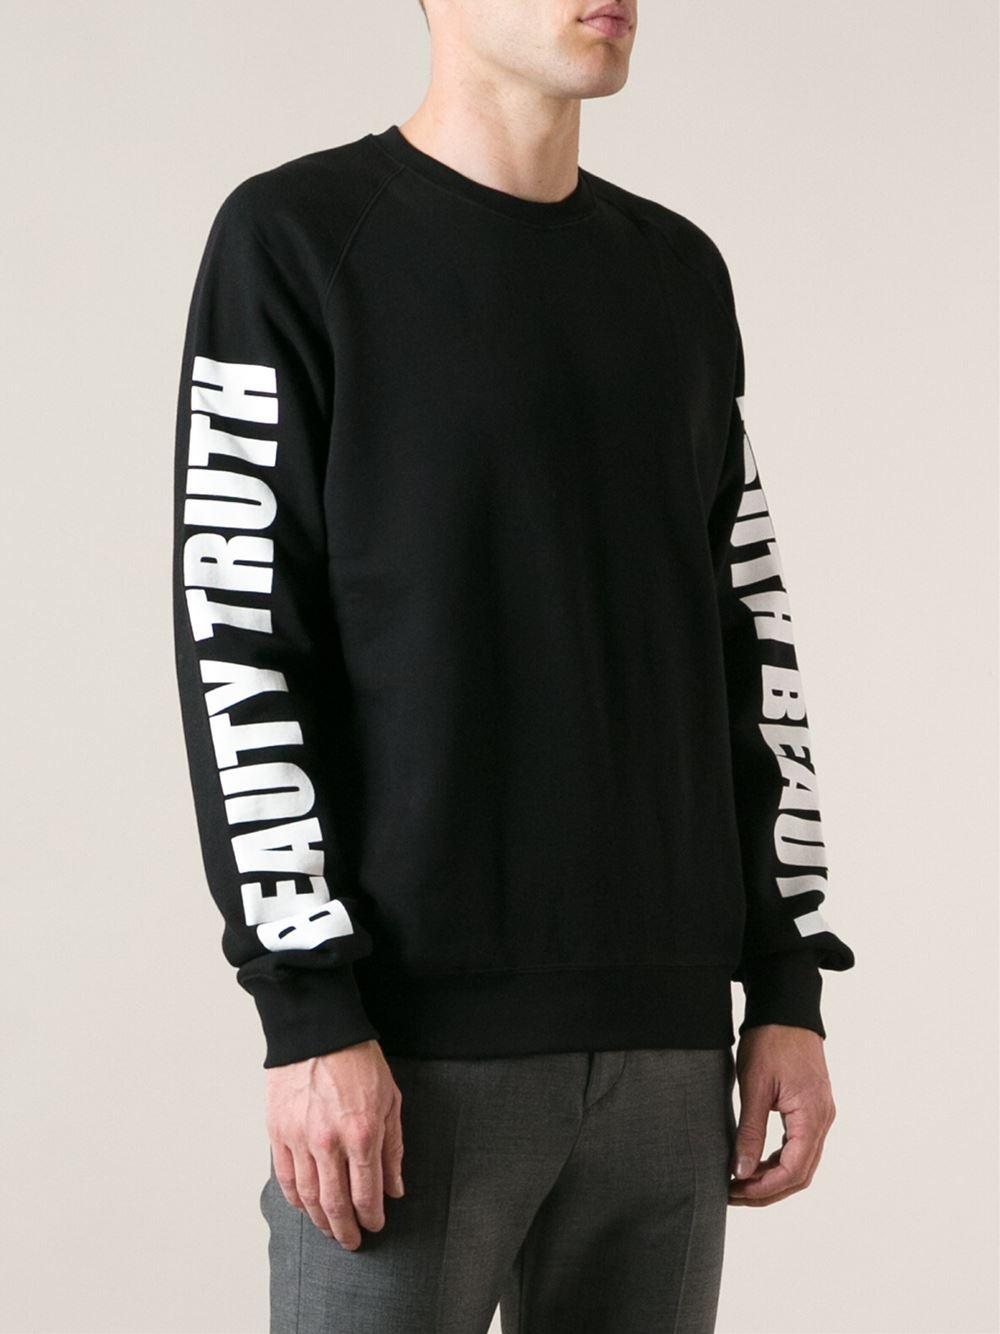 Msgm Printed Cotton Terry Sweatshirt In Black Lyst